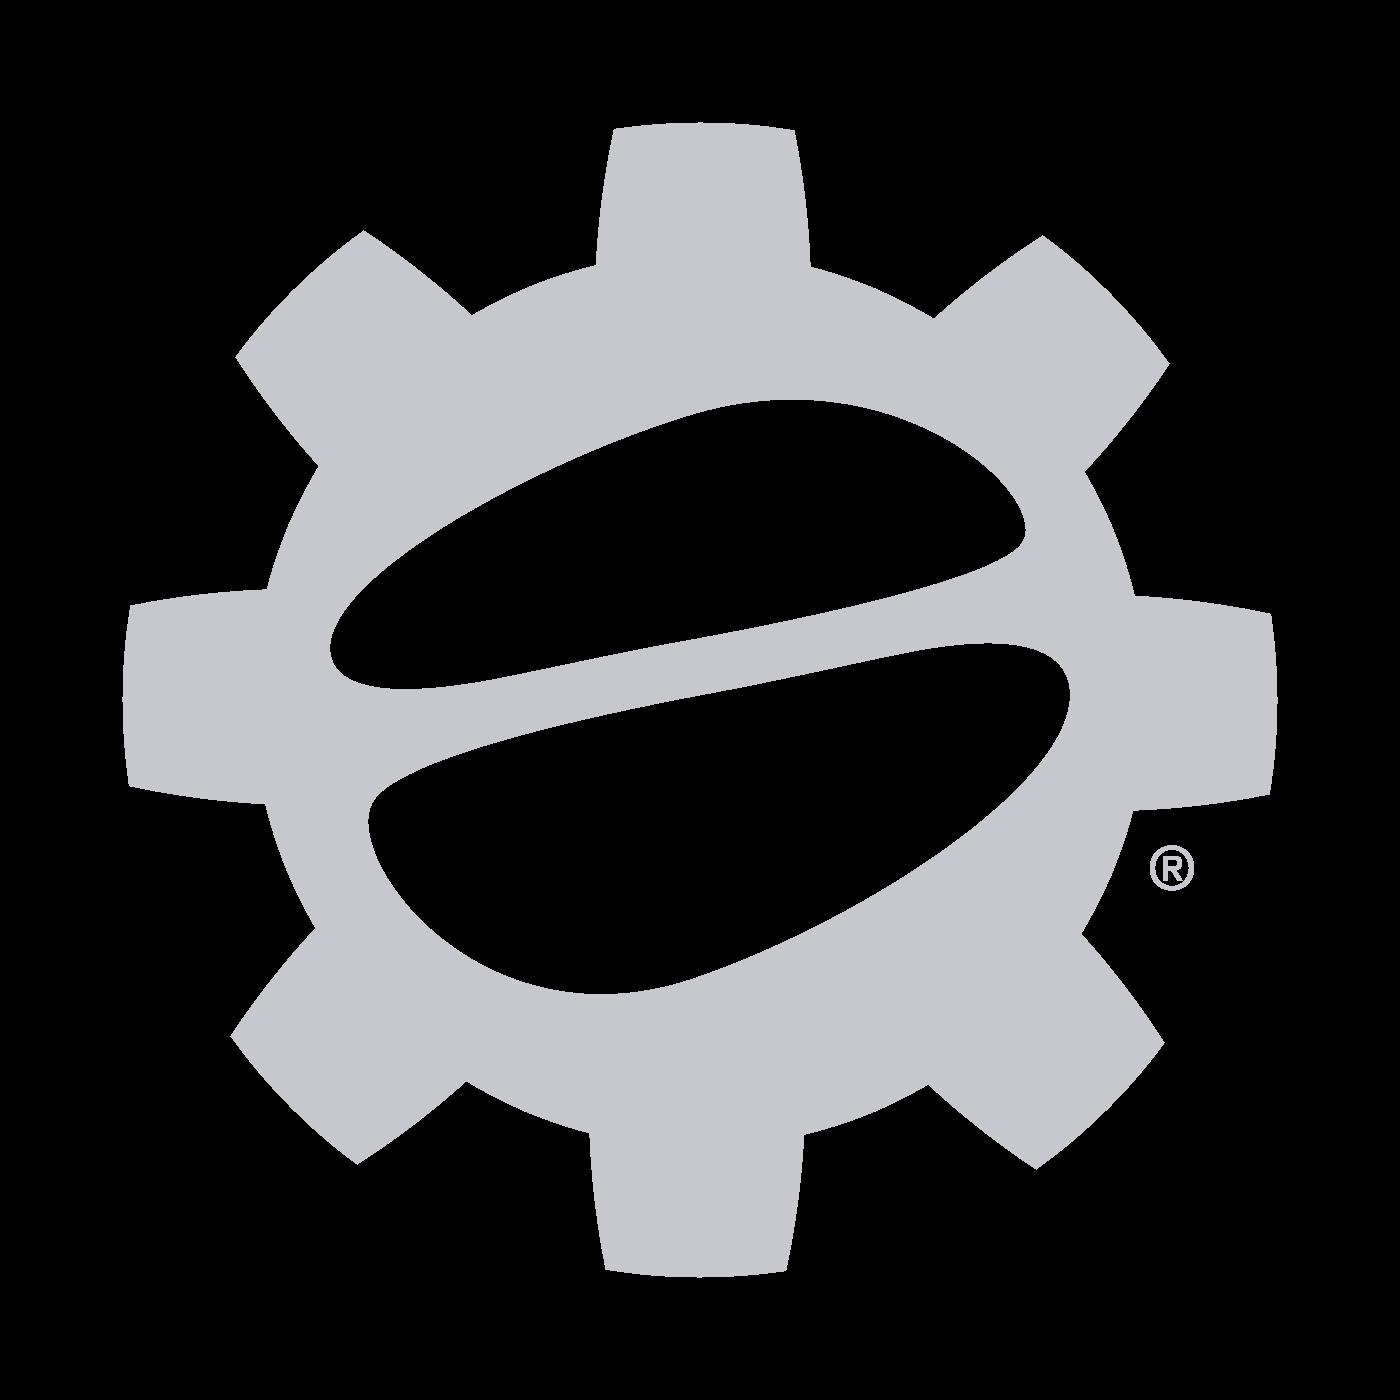 Philips 4300 LatteGo Superautomatic Espresso Machine (Certified Refurbished)